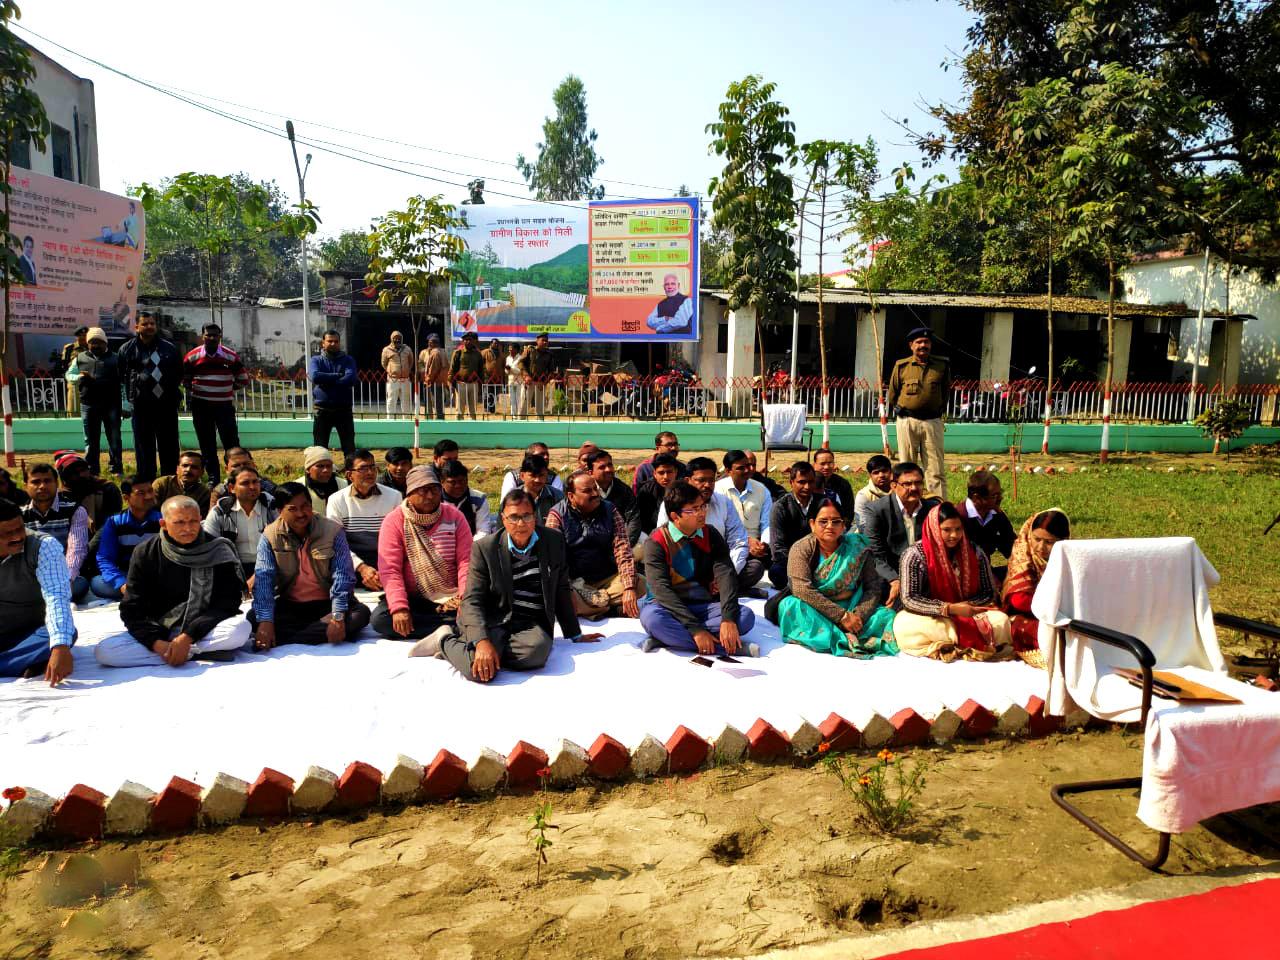 Samajsevi Dr.Bhupendra Madhepuri, DM Navdeep Shukla Zila Parishad Adhyaksha Smt.Manju Devi and others at Samaharnalaya Madhepura.